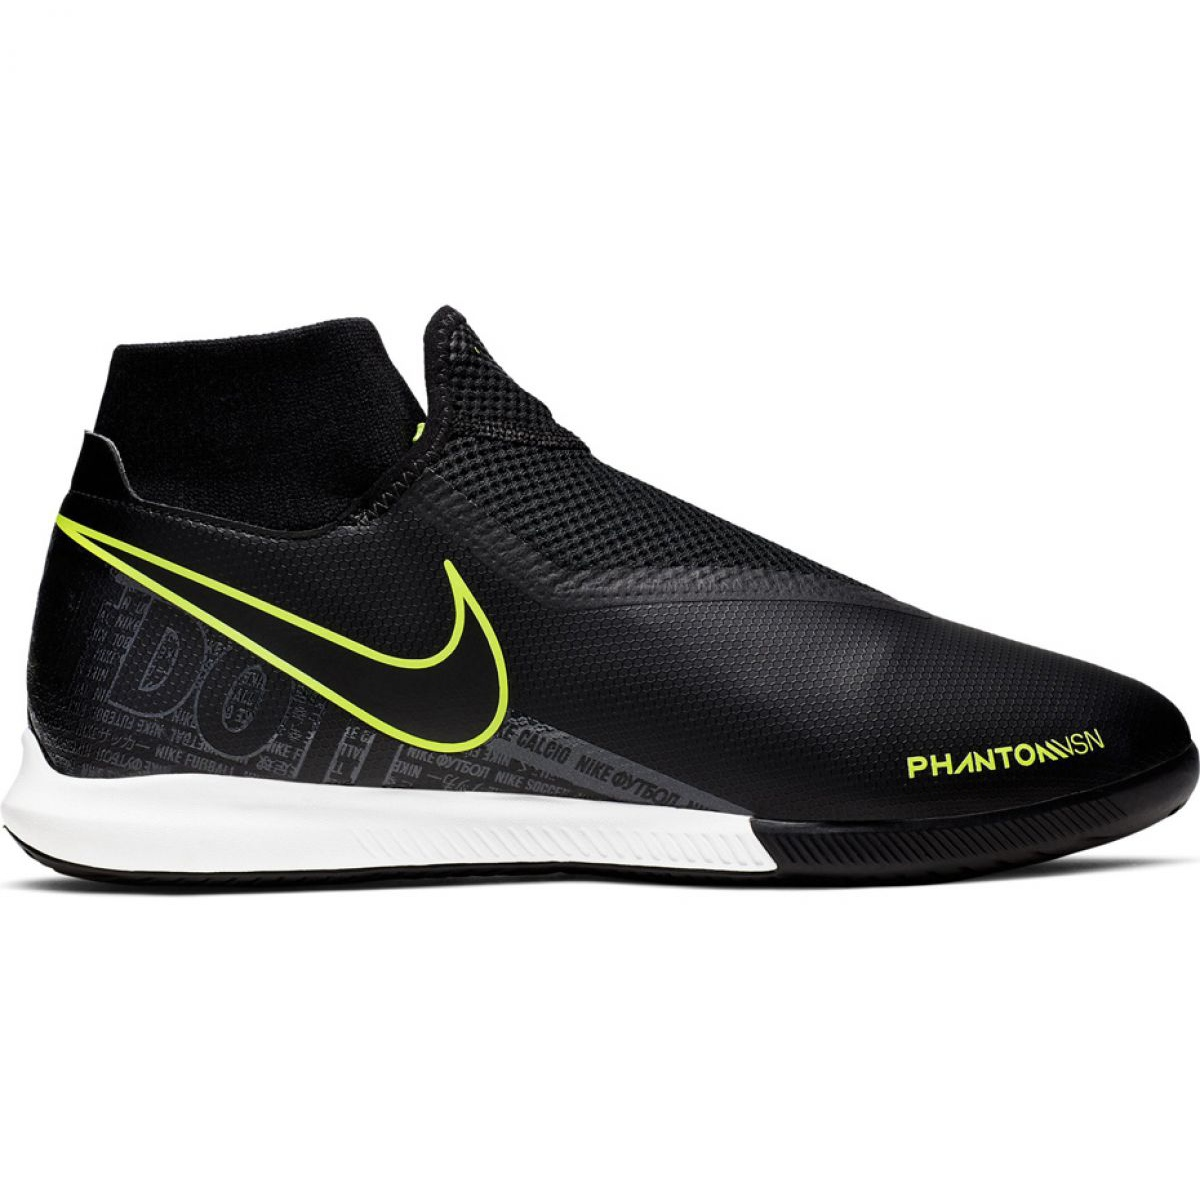 Nike Phantom VSN Academy DF IC AO3267 007